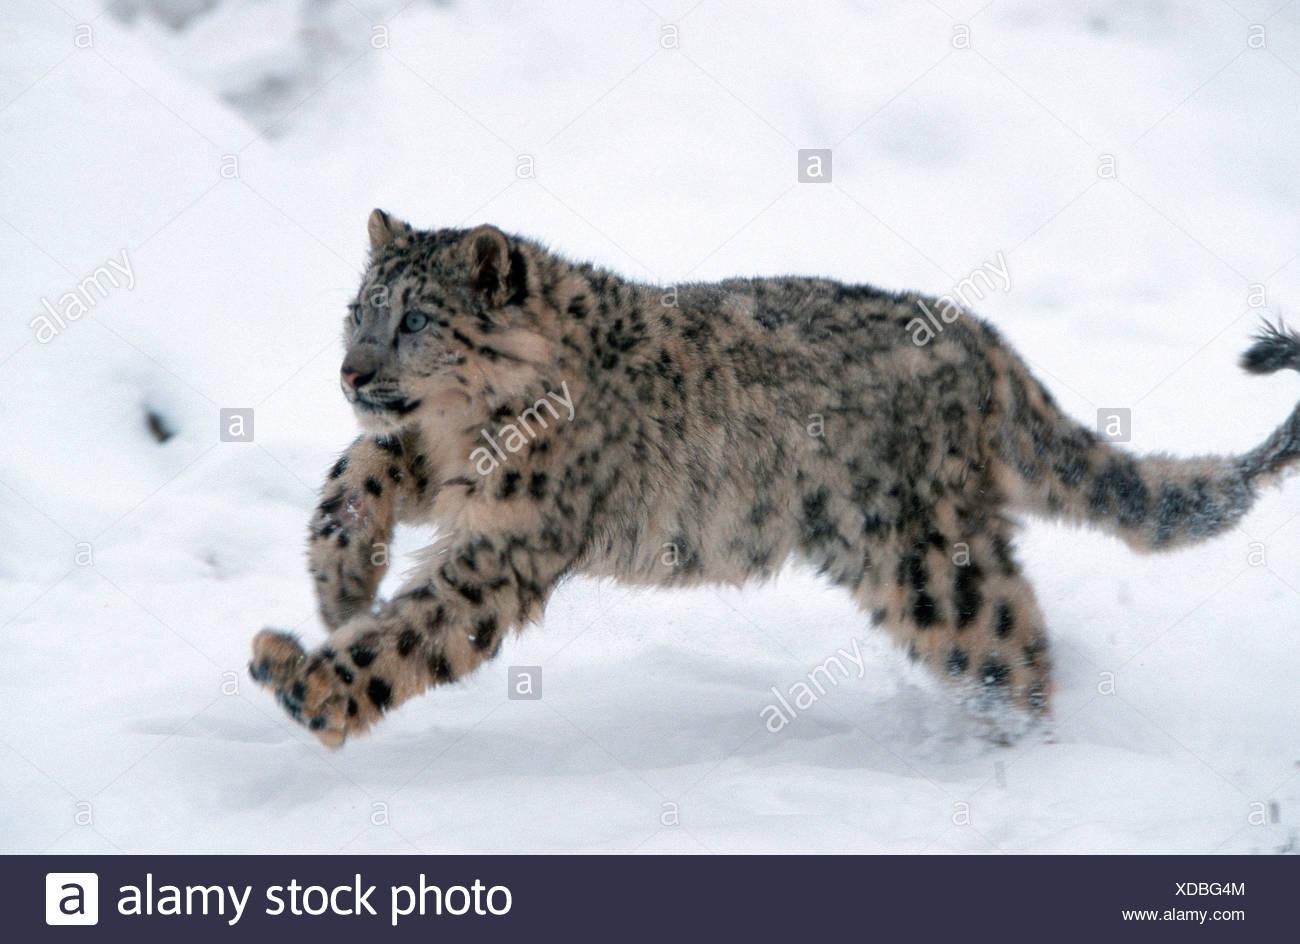 Snow Leopard Irbis Schneeleopard Banque D Images Photo Stock